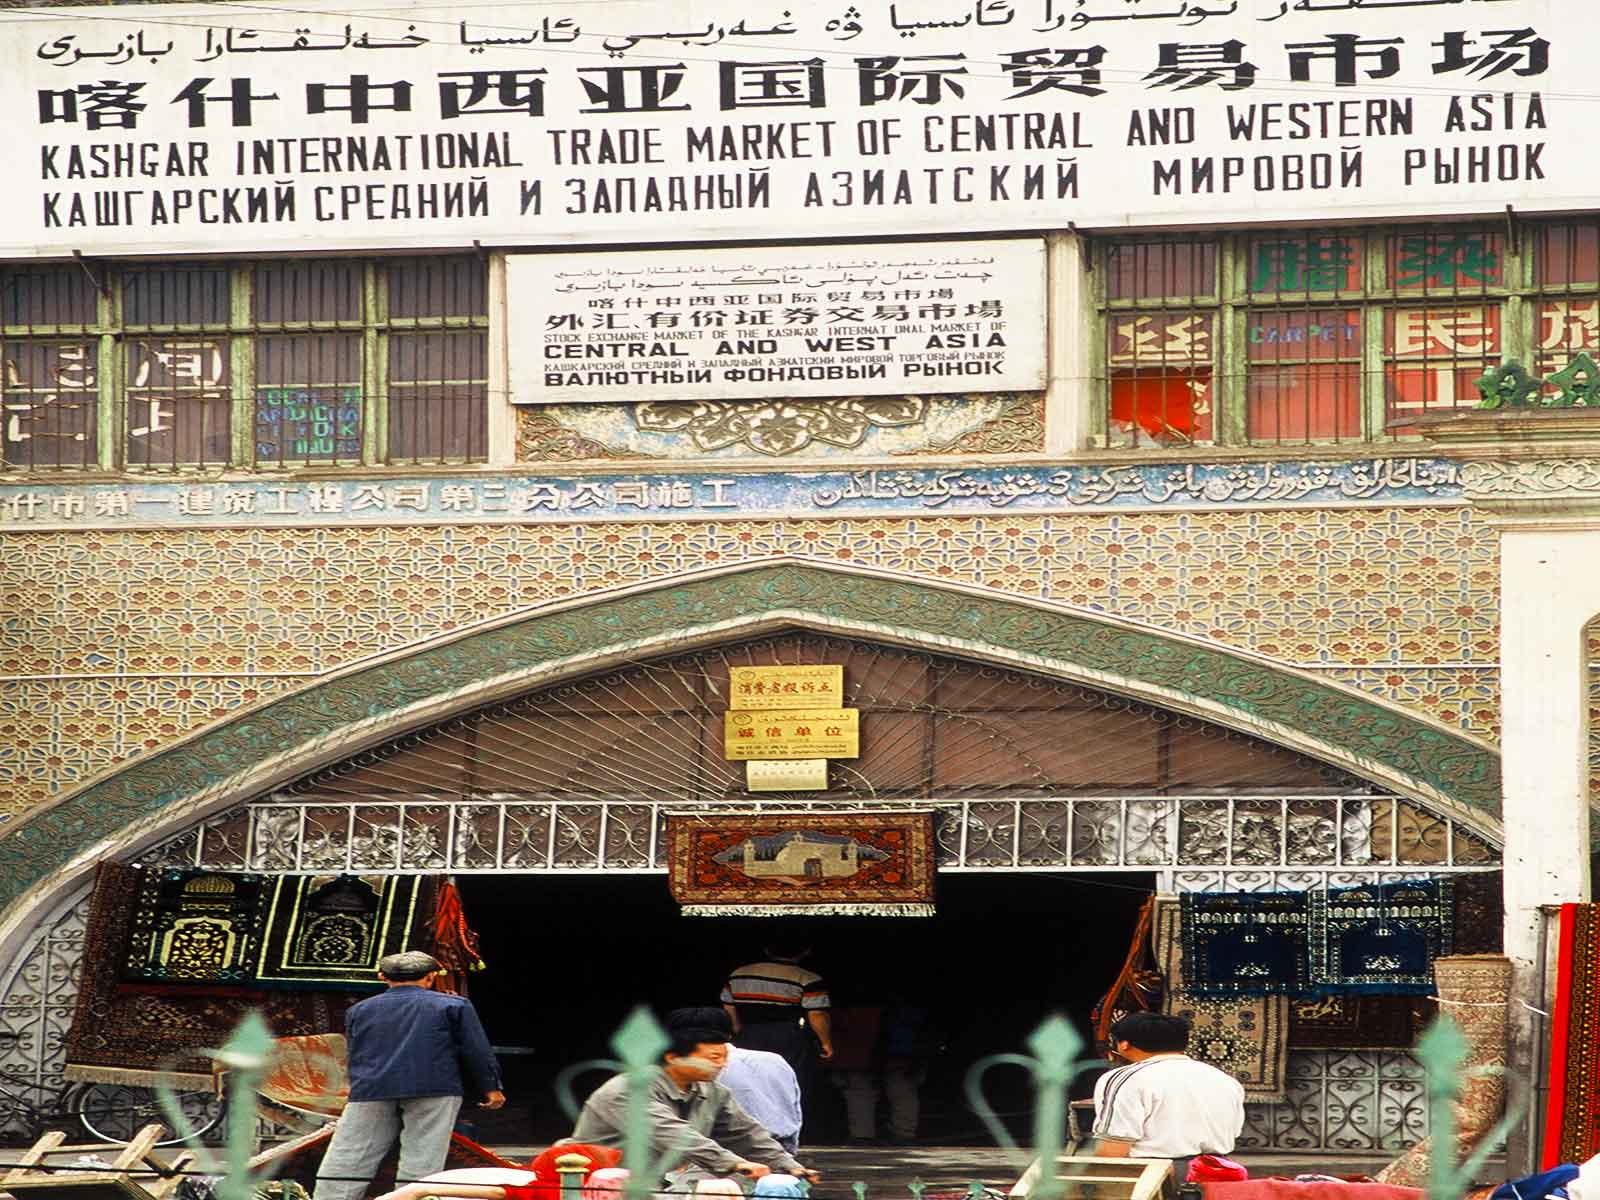 Kashgar International Trade Market - Silk Road photo journal - Steven Andrew Martin - study abroad field research